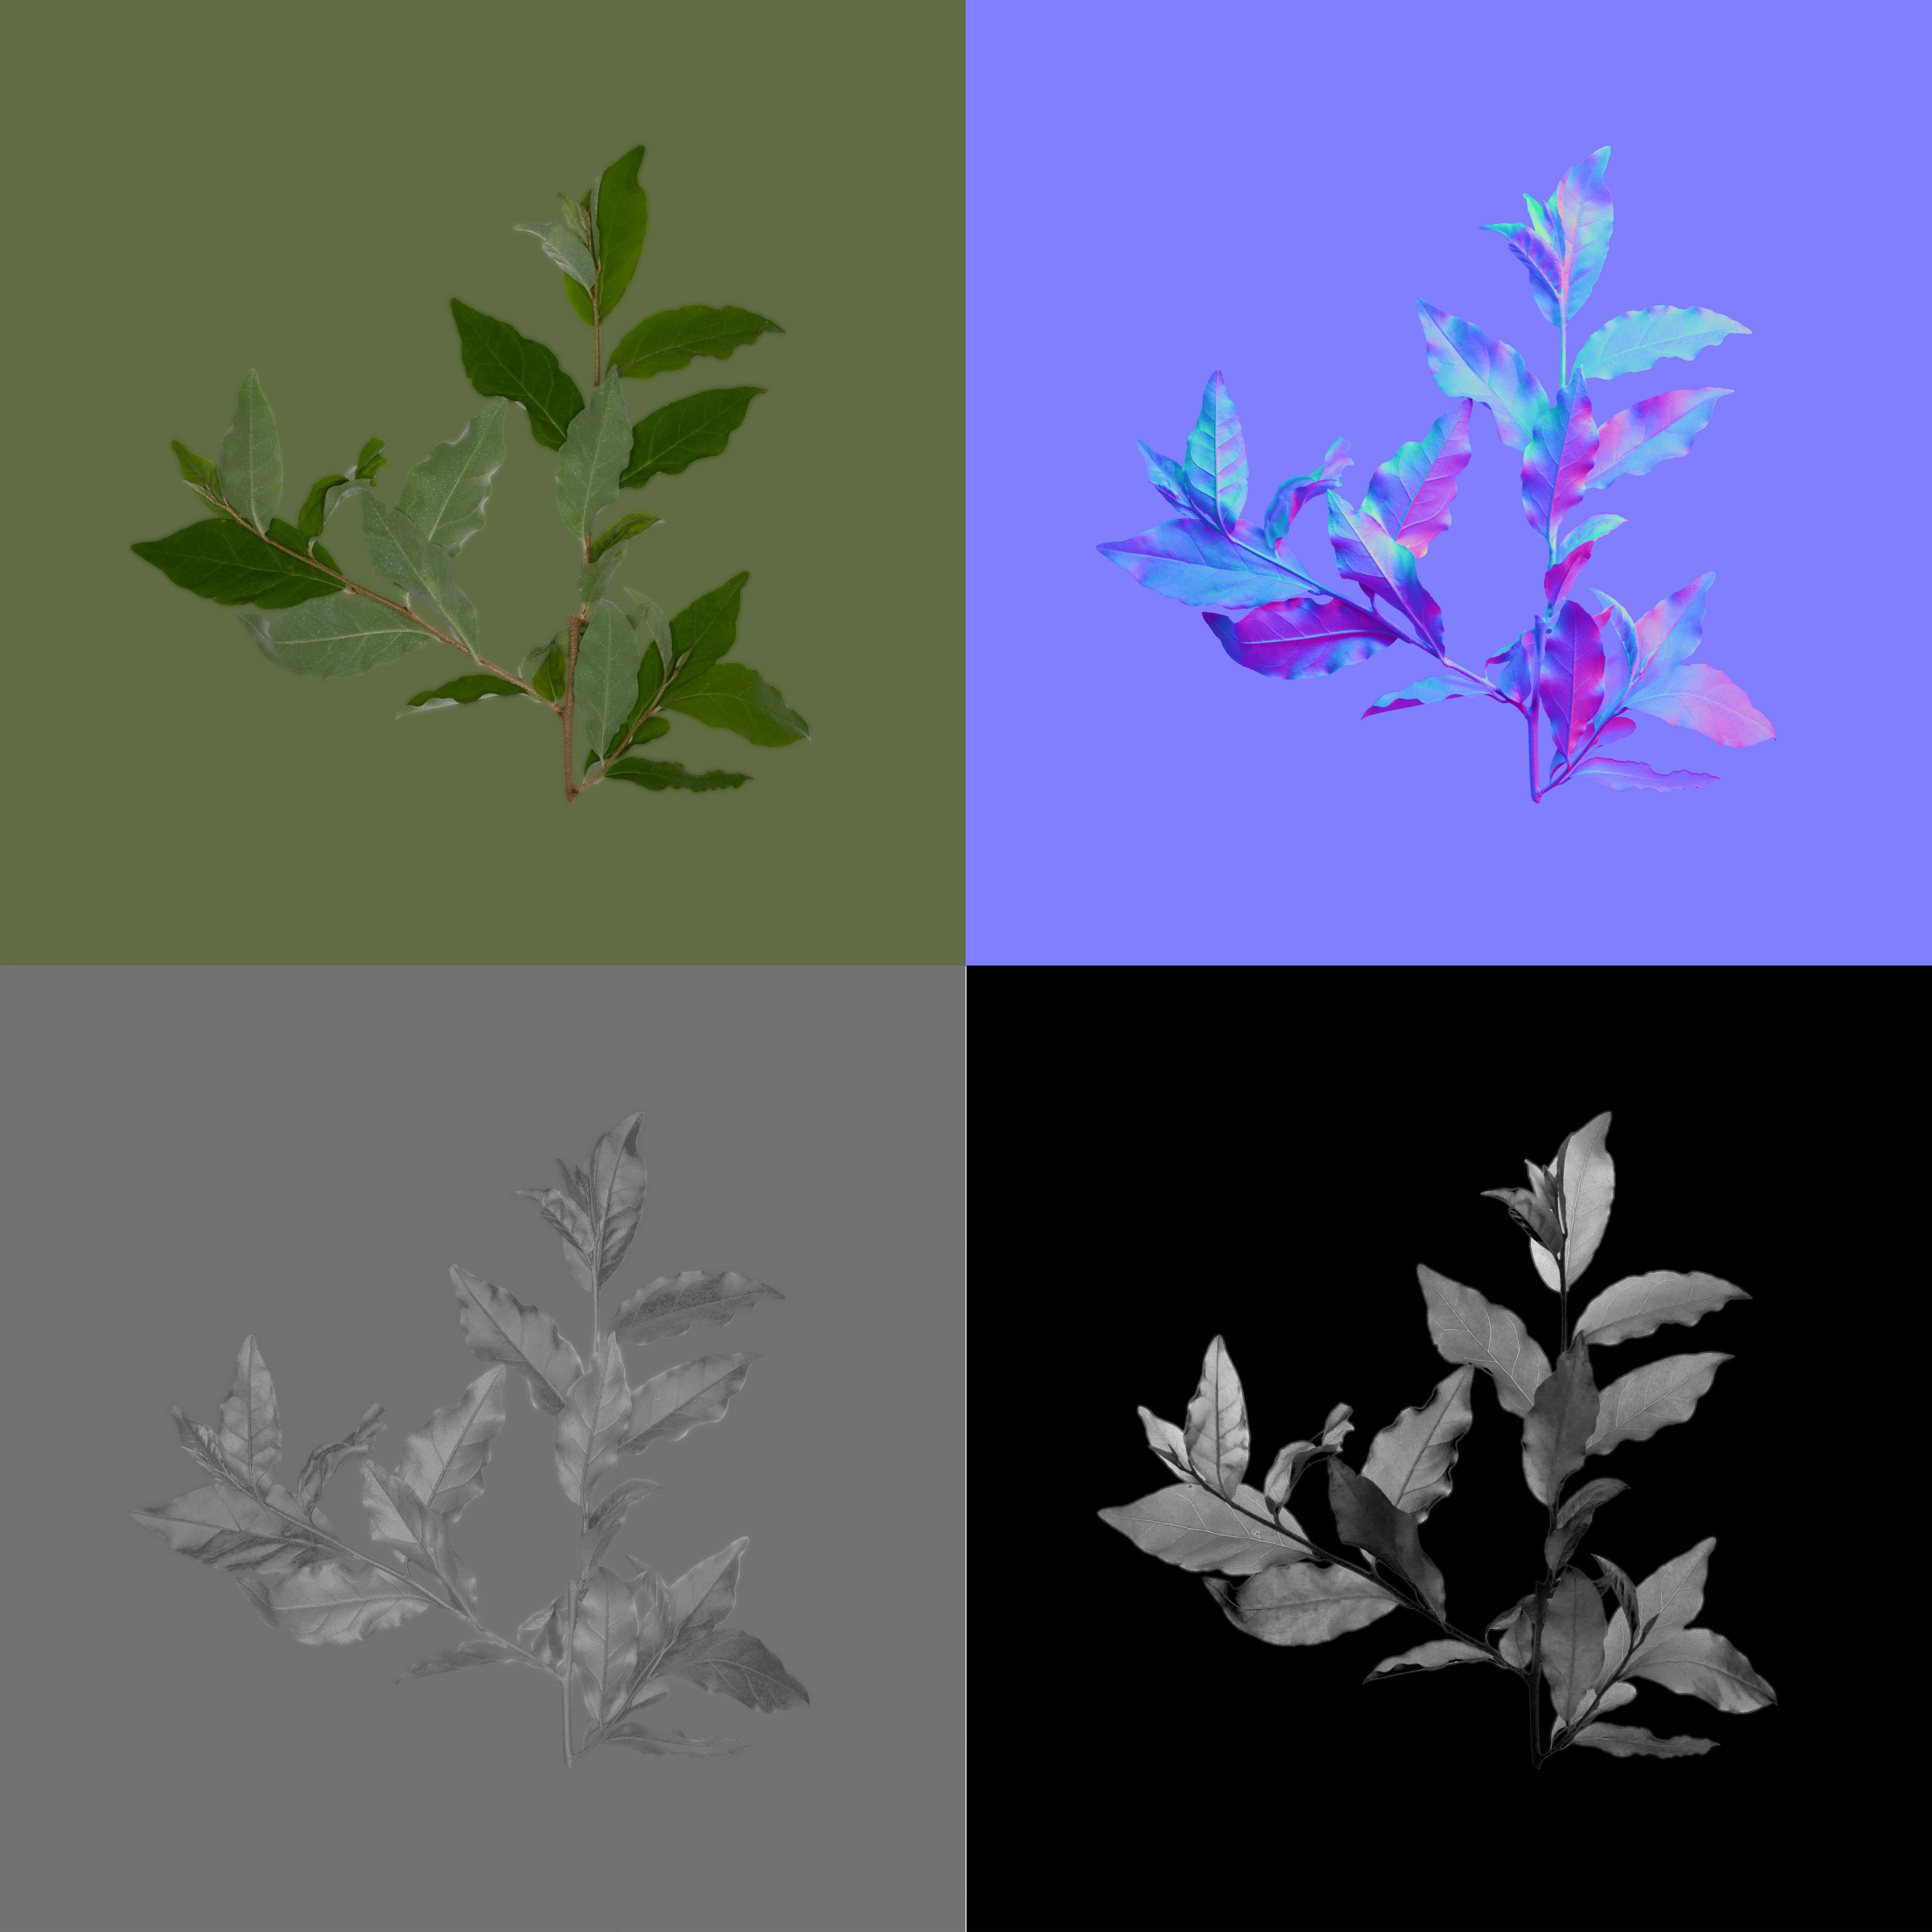 AutumnOliveBranchMedium01.jpg